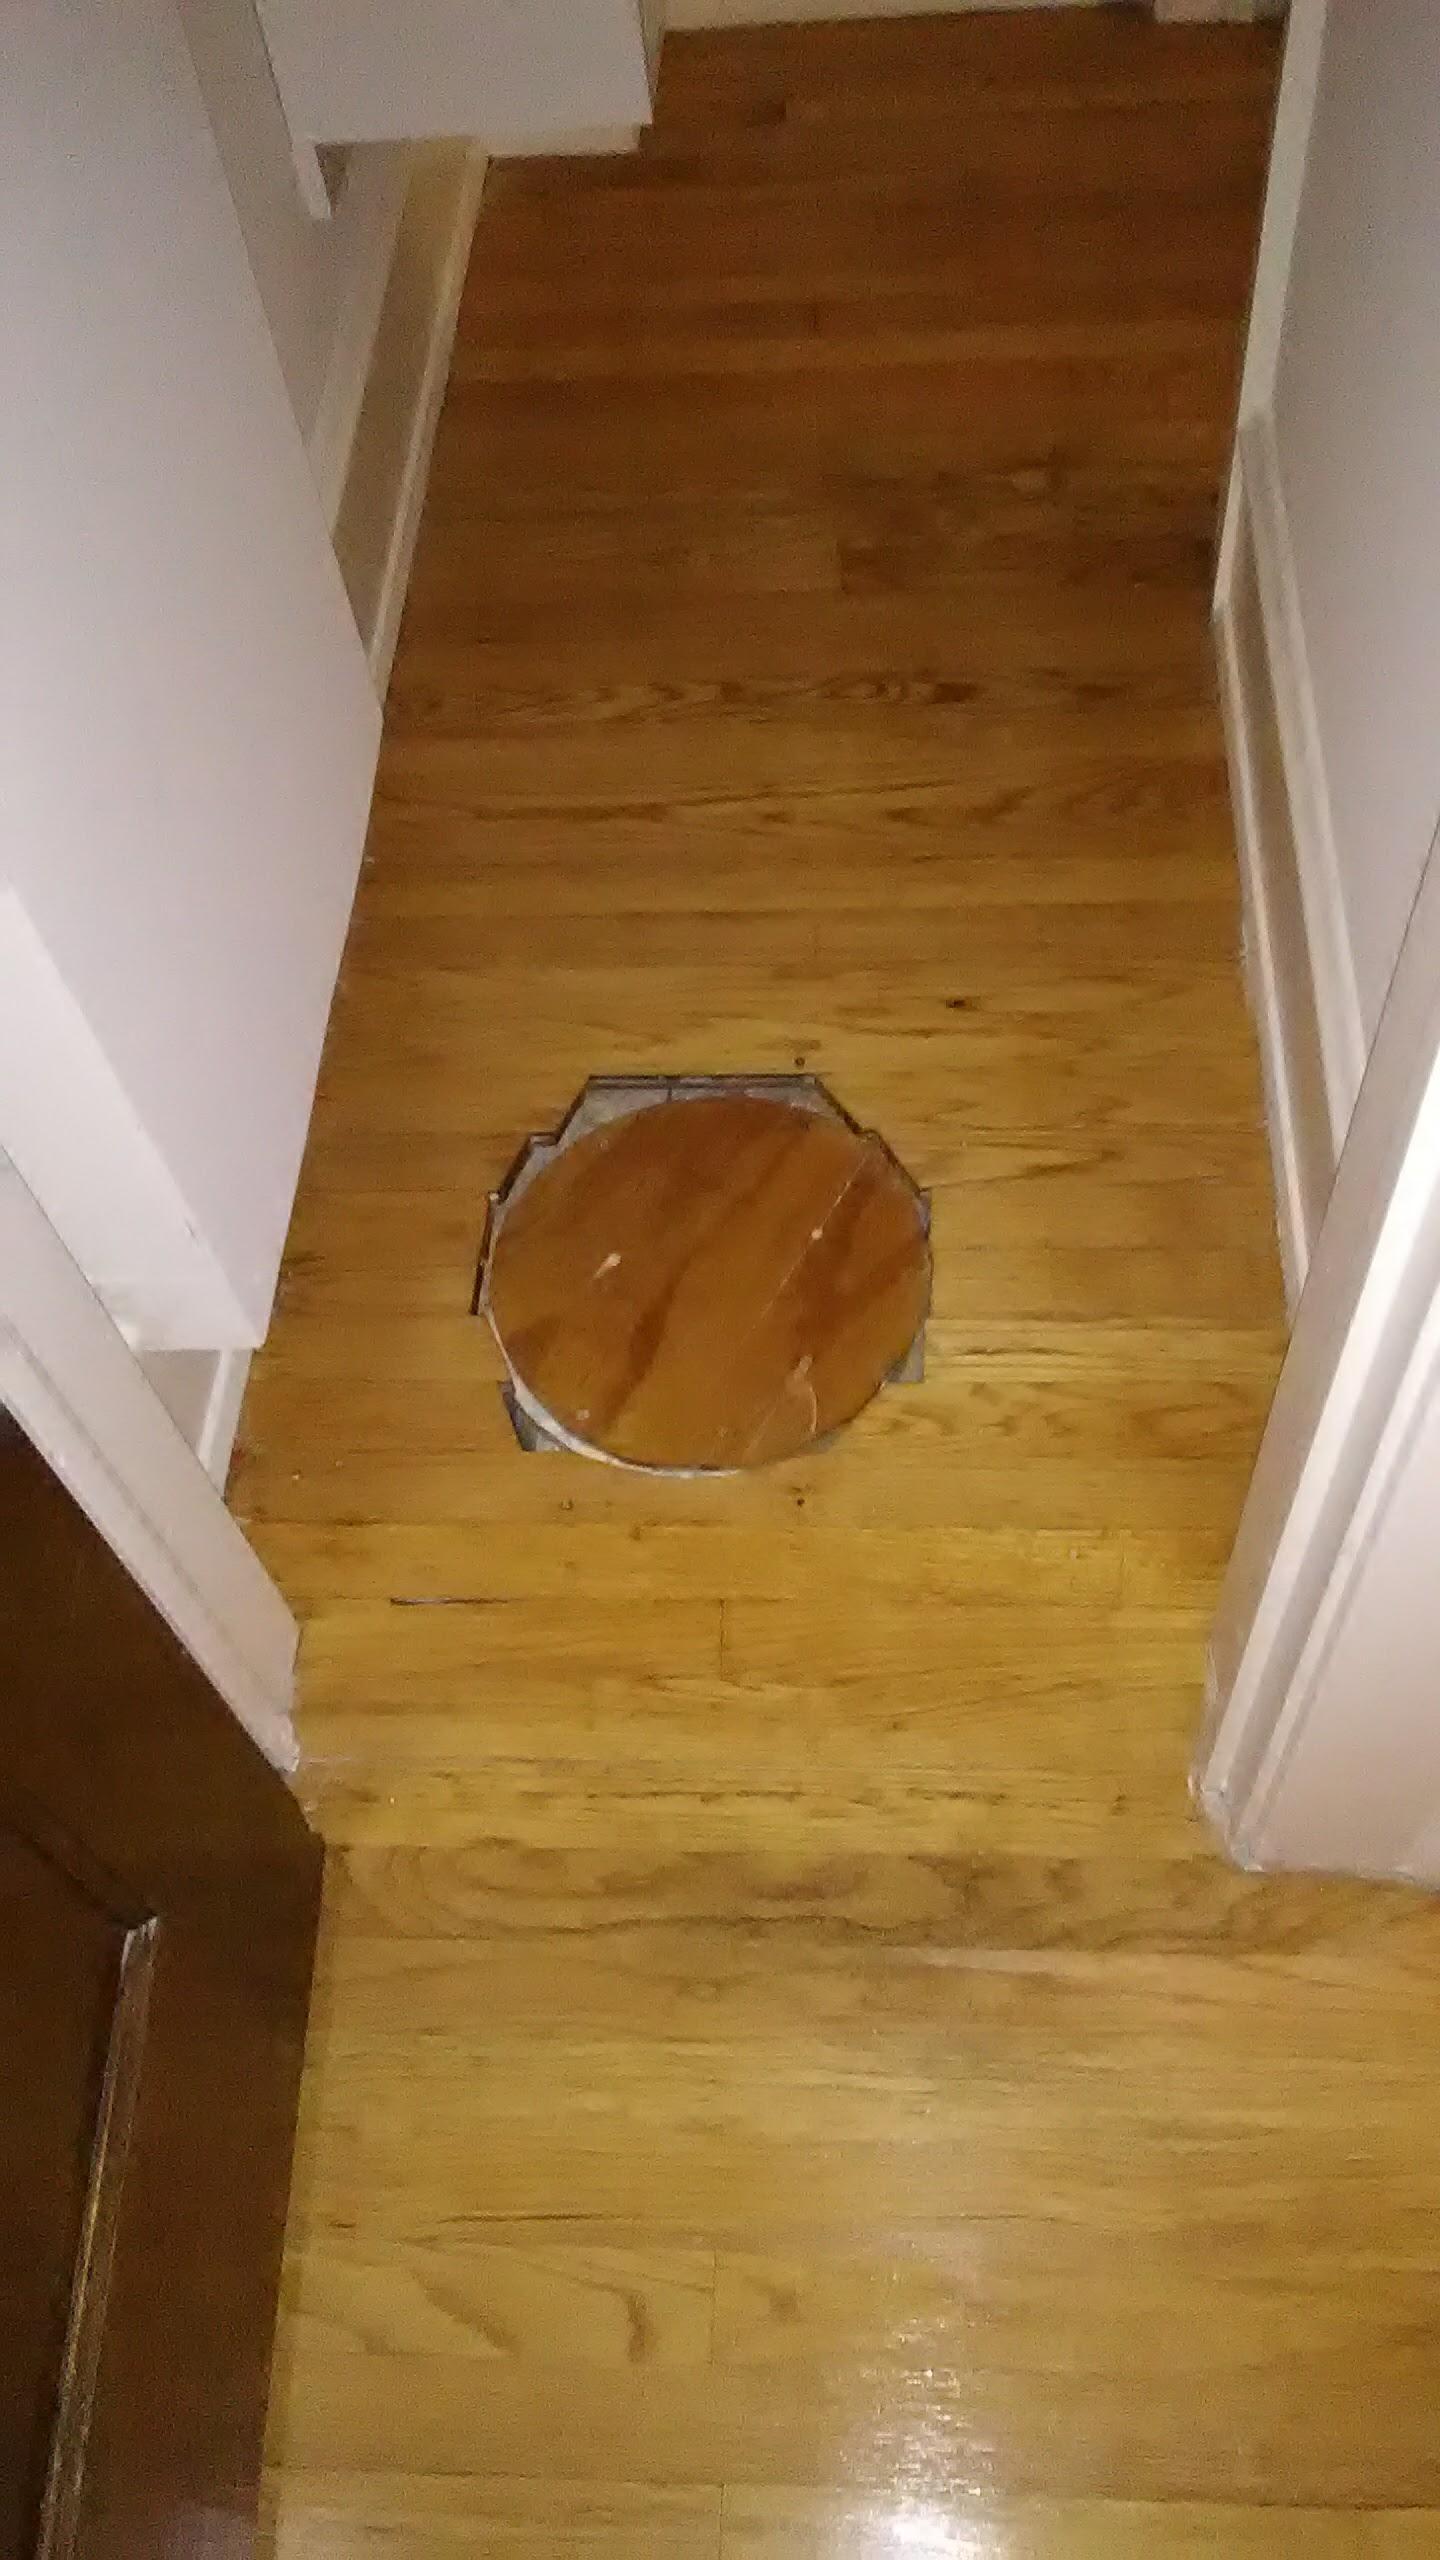 Hole in floor